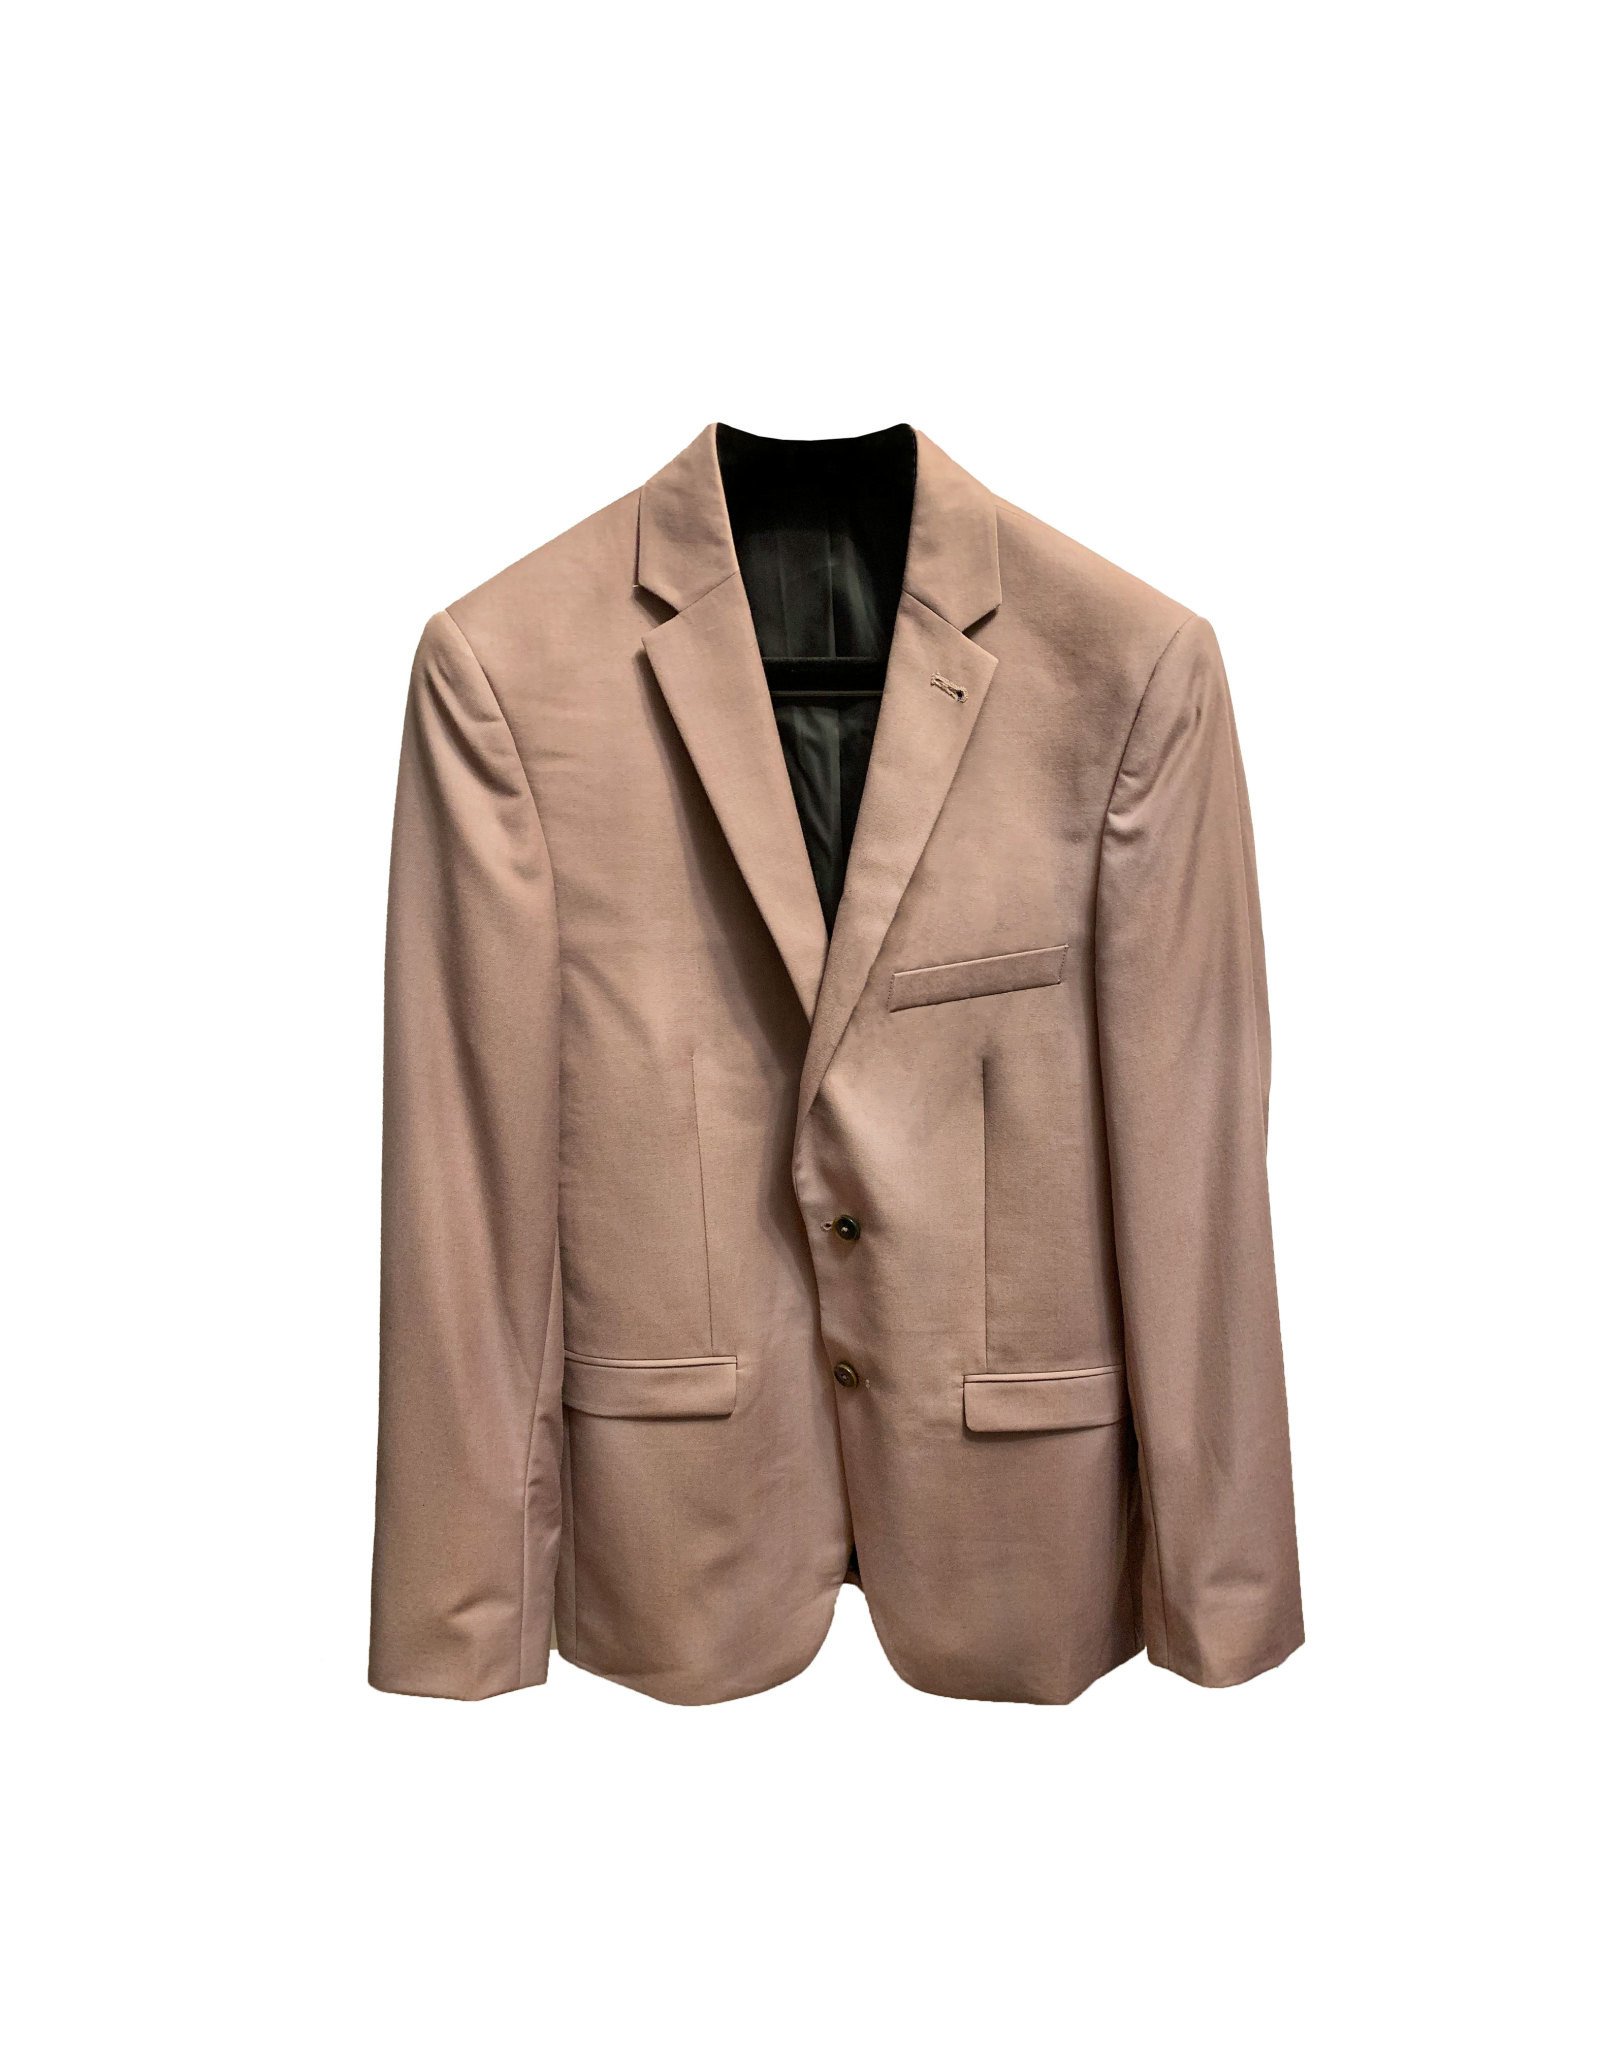 1670 1670 Slim Fit Notch Lapel Sports Coat Size: 40